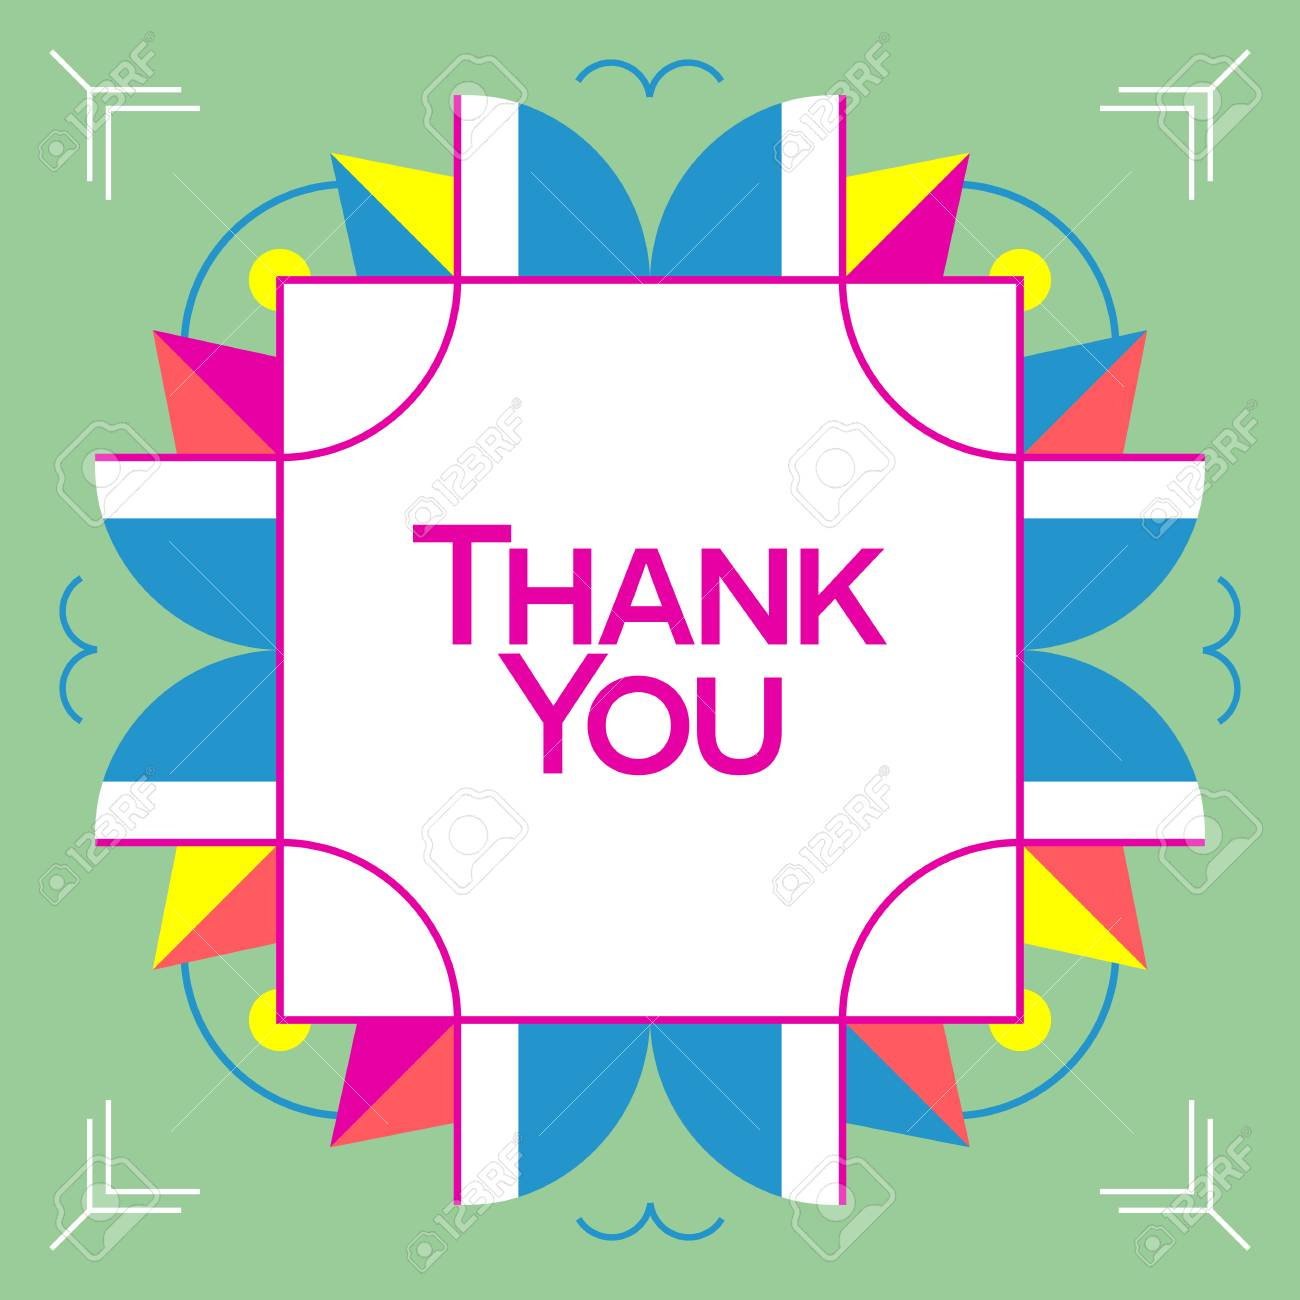 Thank you greeting card thanksgiving design abstract geometric thank you greeting card thanksgiving design abstract geometric elements layout template card invitation kristyandbryce Choice Image